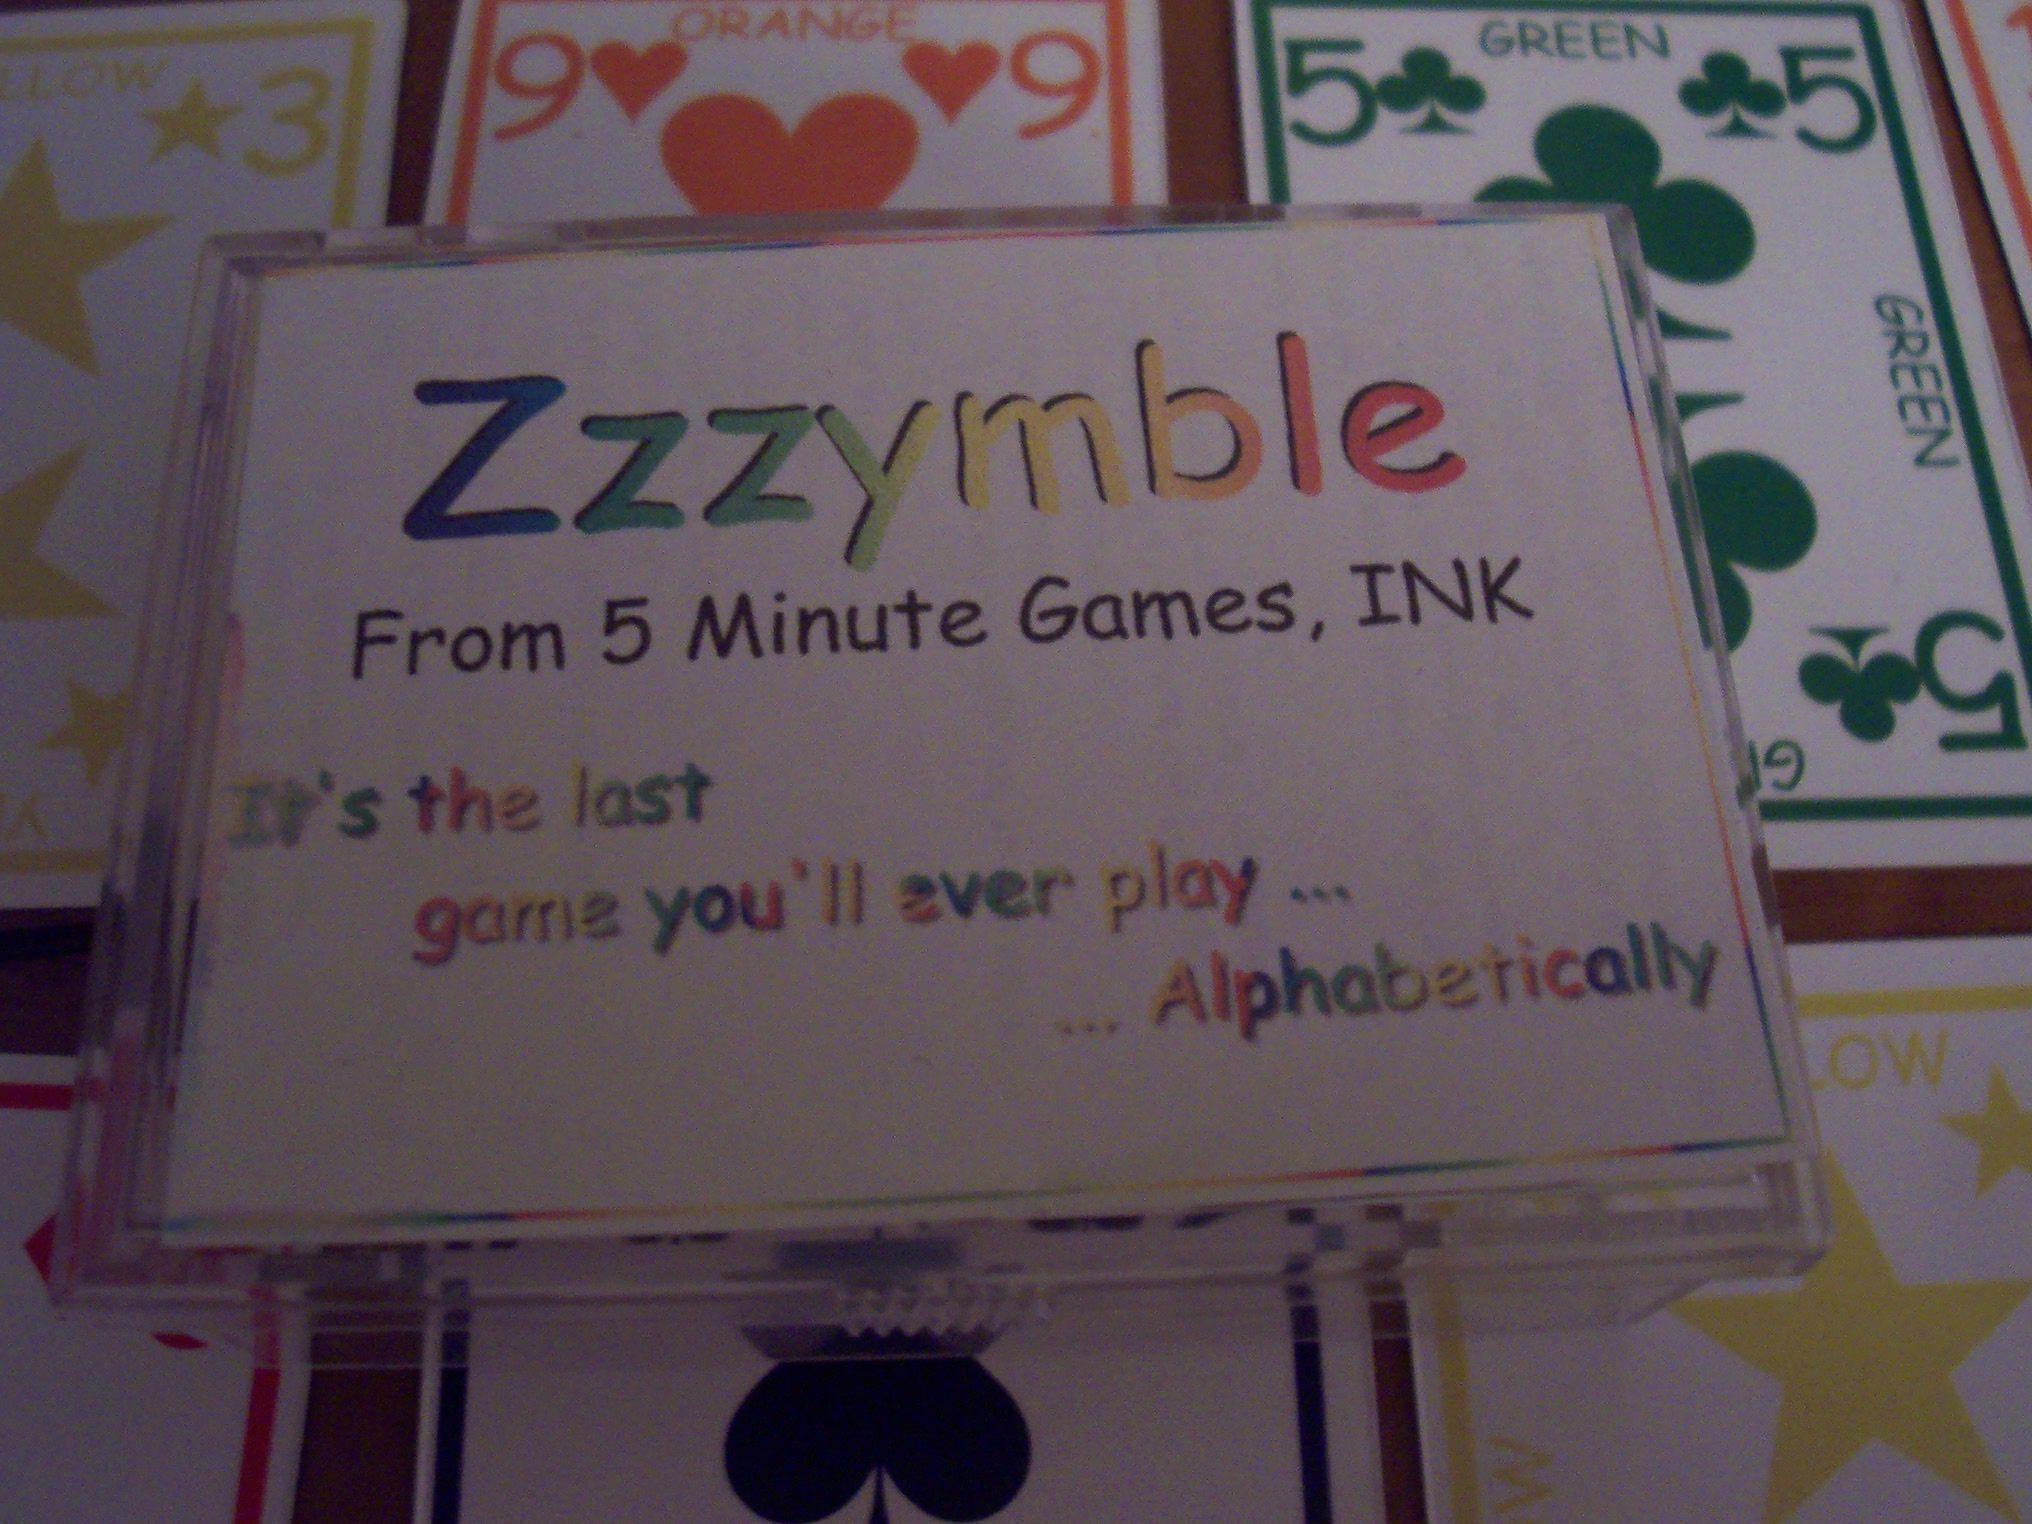 Zzzymble